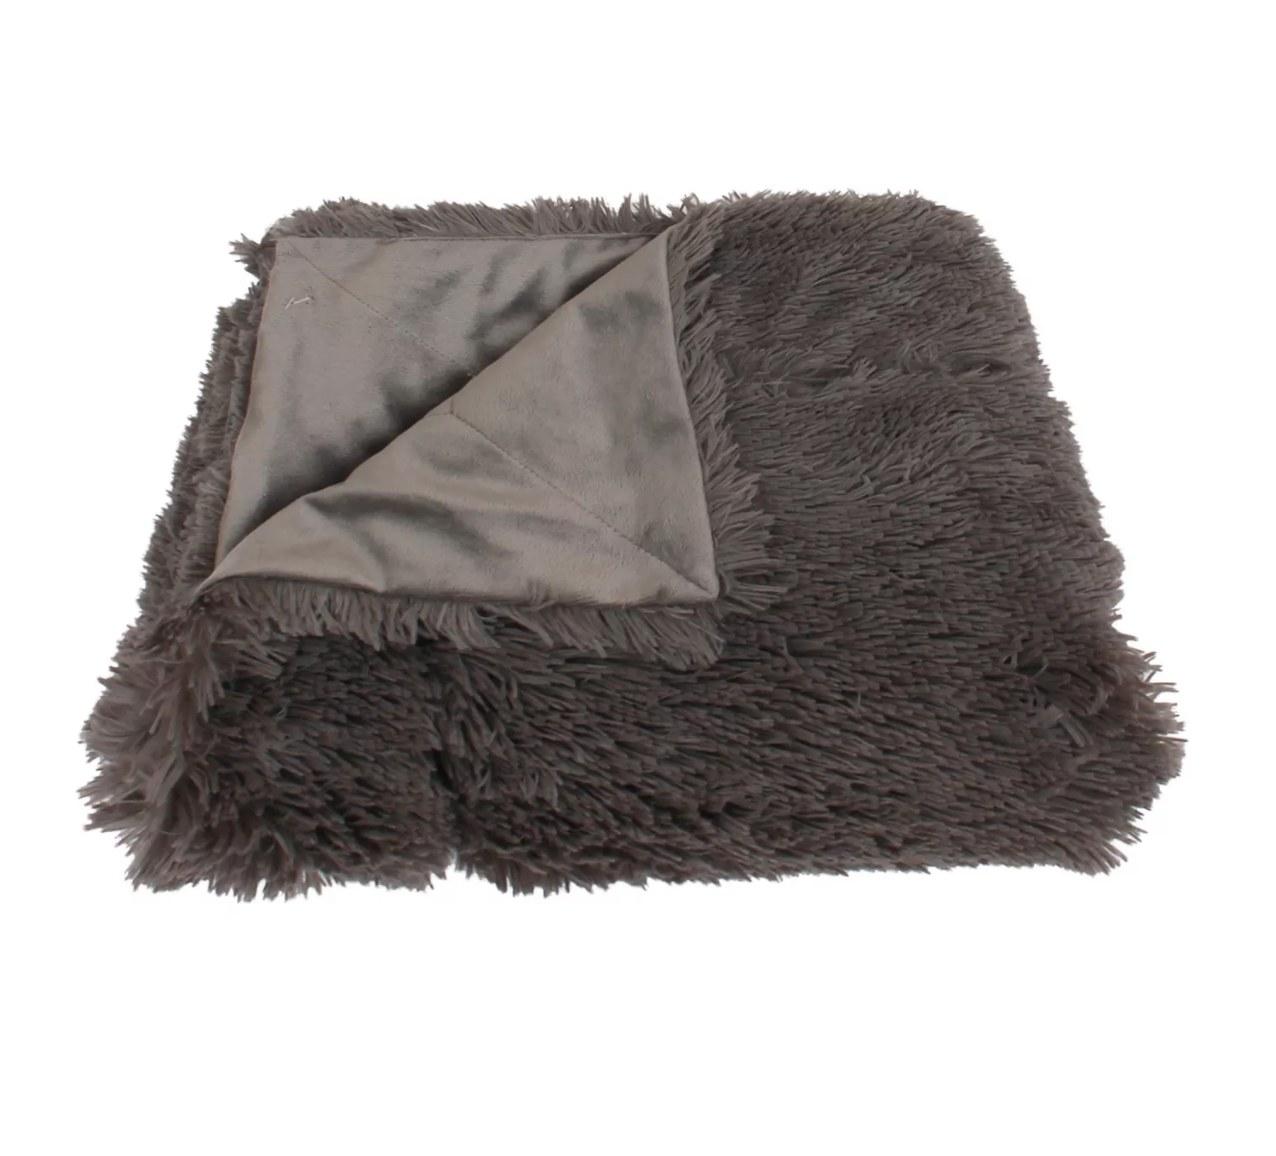 The faux fur blanket in gray